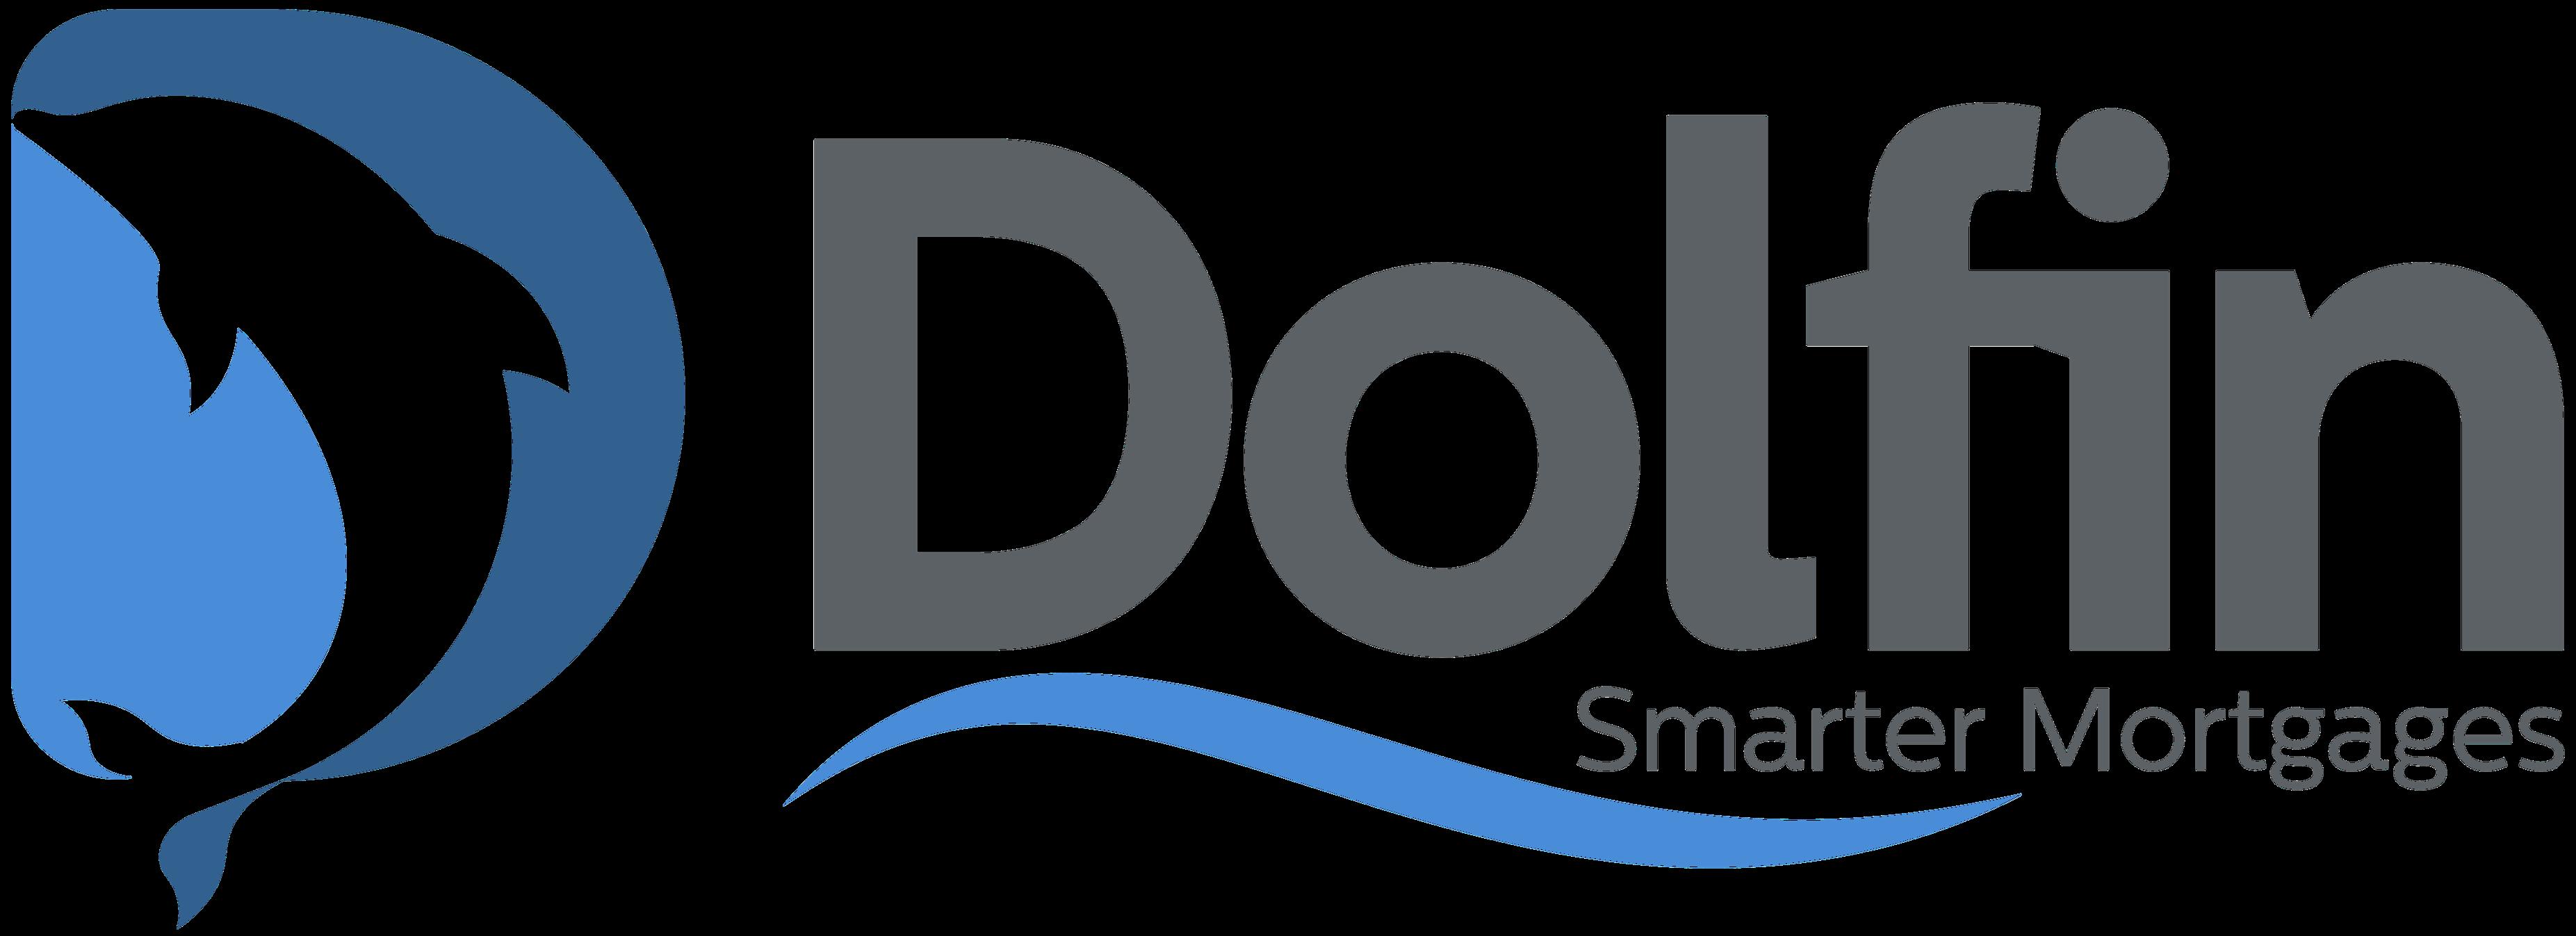 Dolfin Home Loans